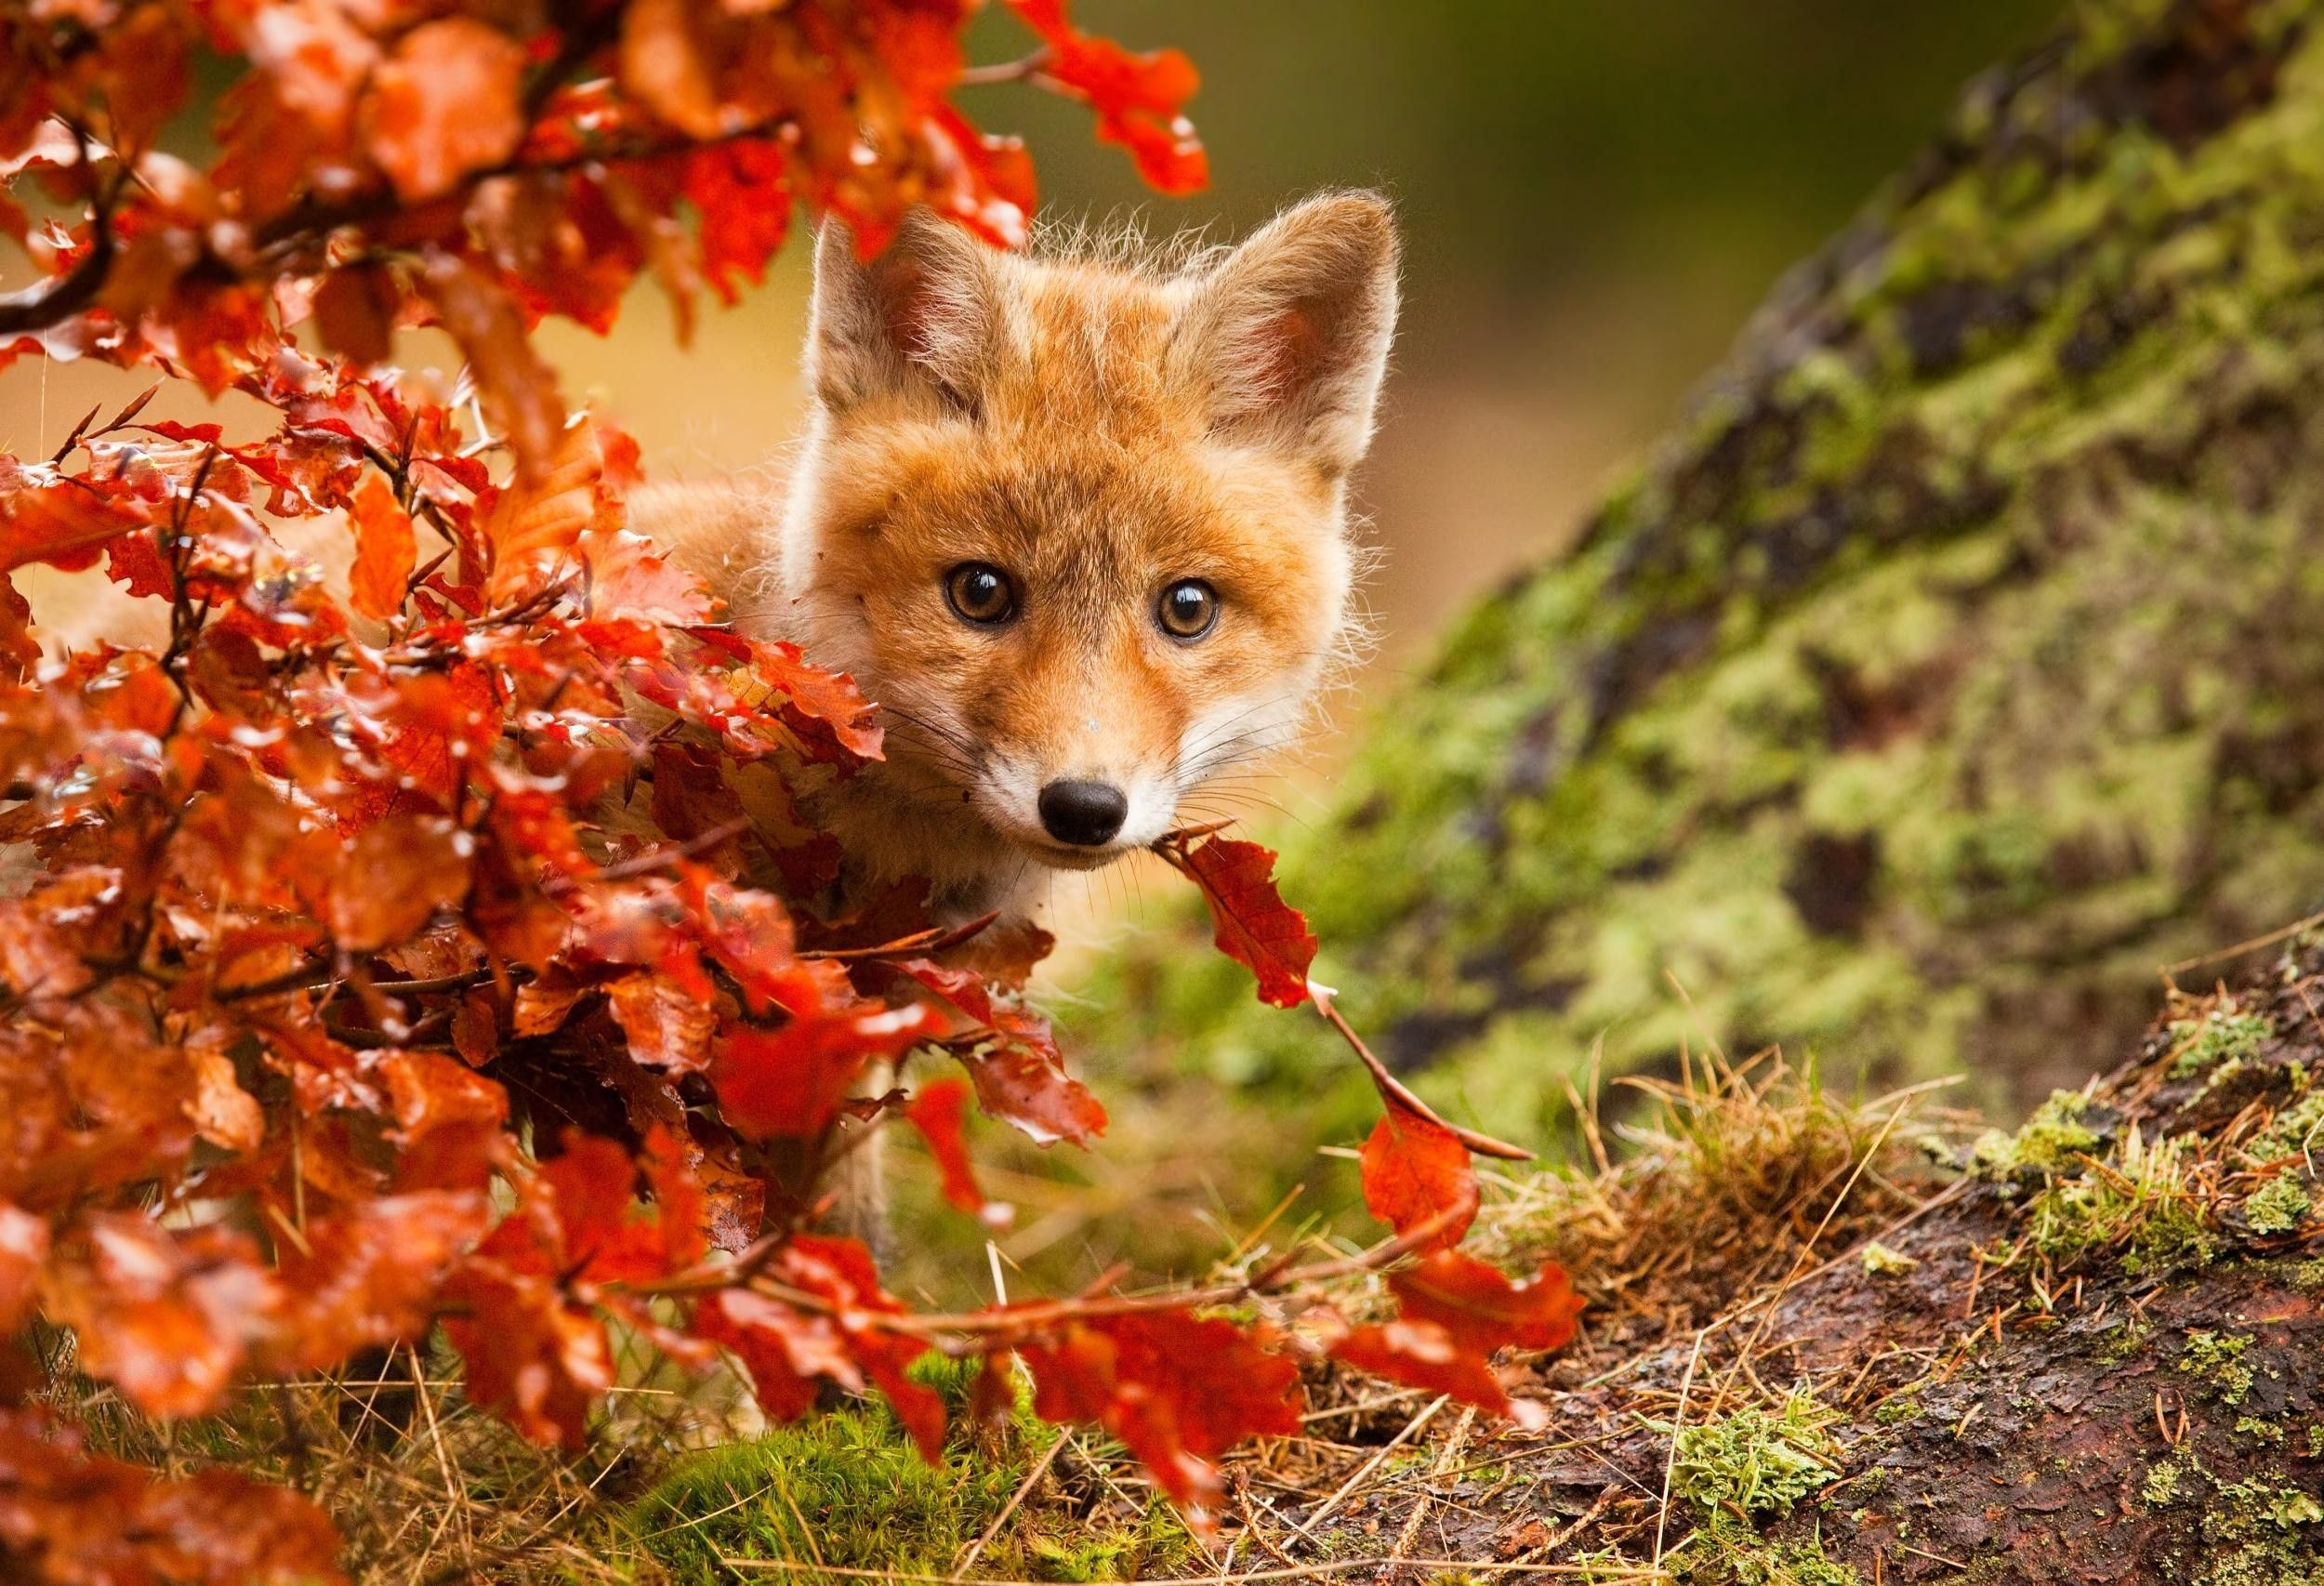 Autumn Animals Wallpapers   Top Autumn Animals Backgrounds 2500x1706